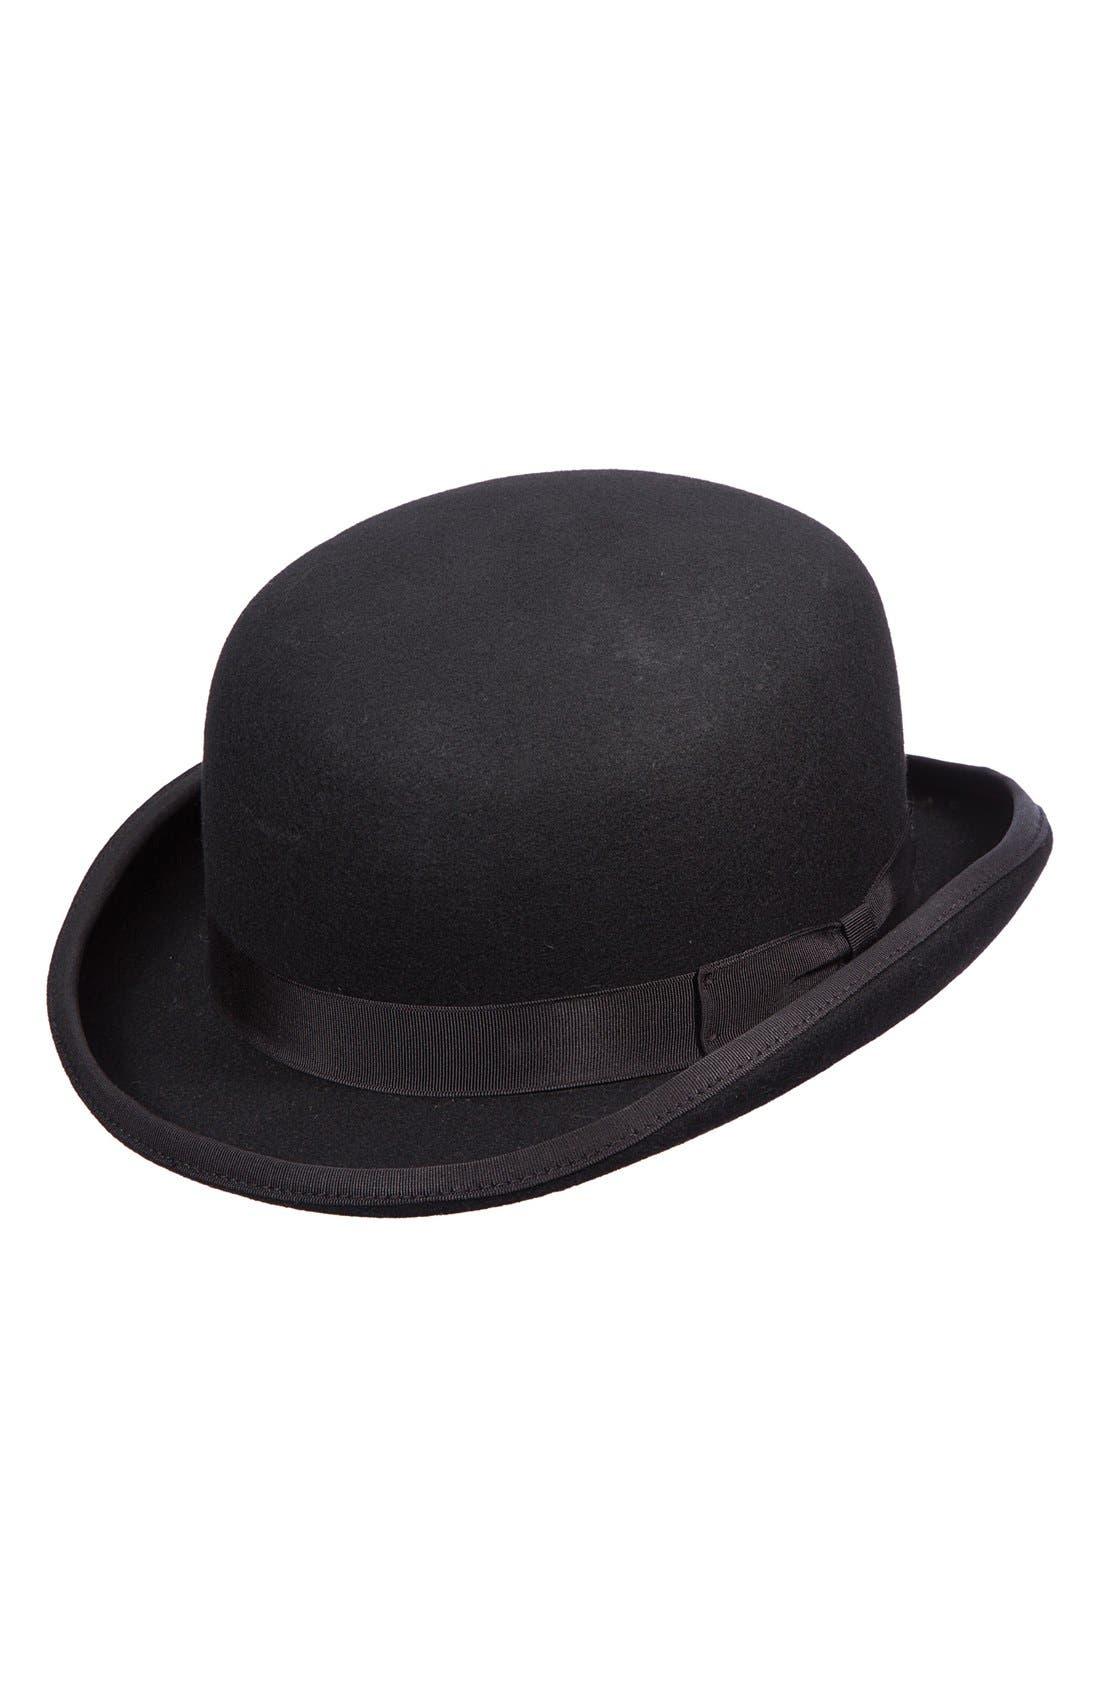 Wool Felt Bowler Hat,                         Main,                         color, BLACK